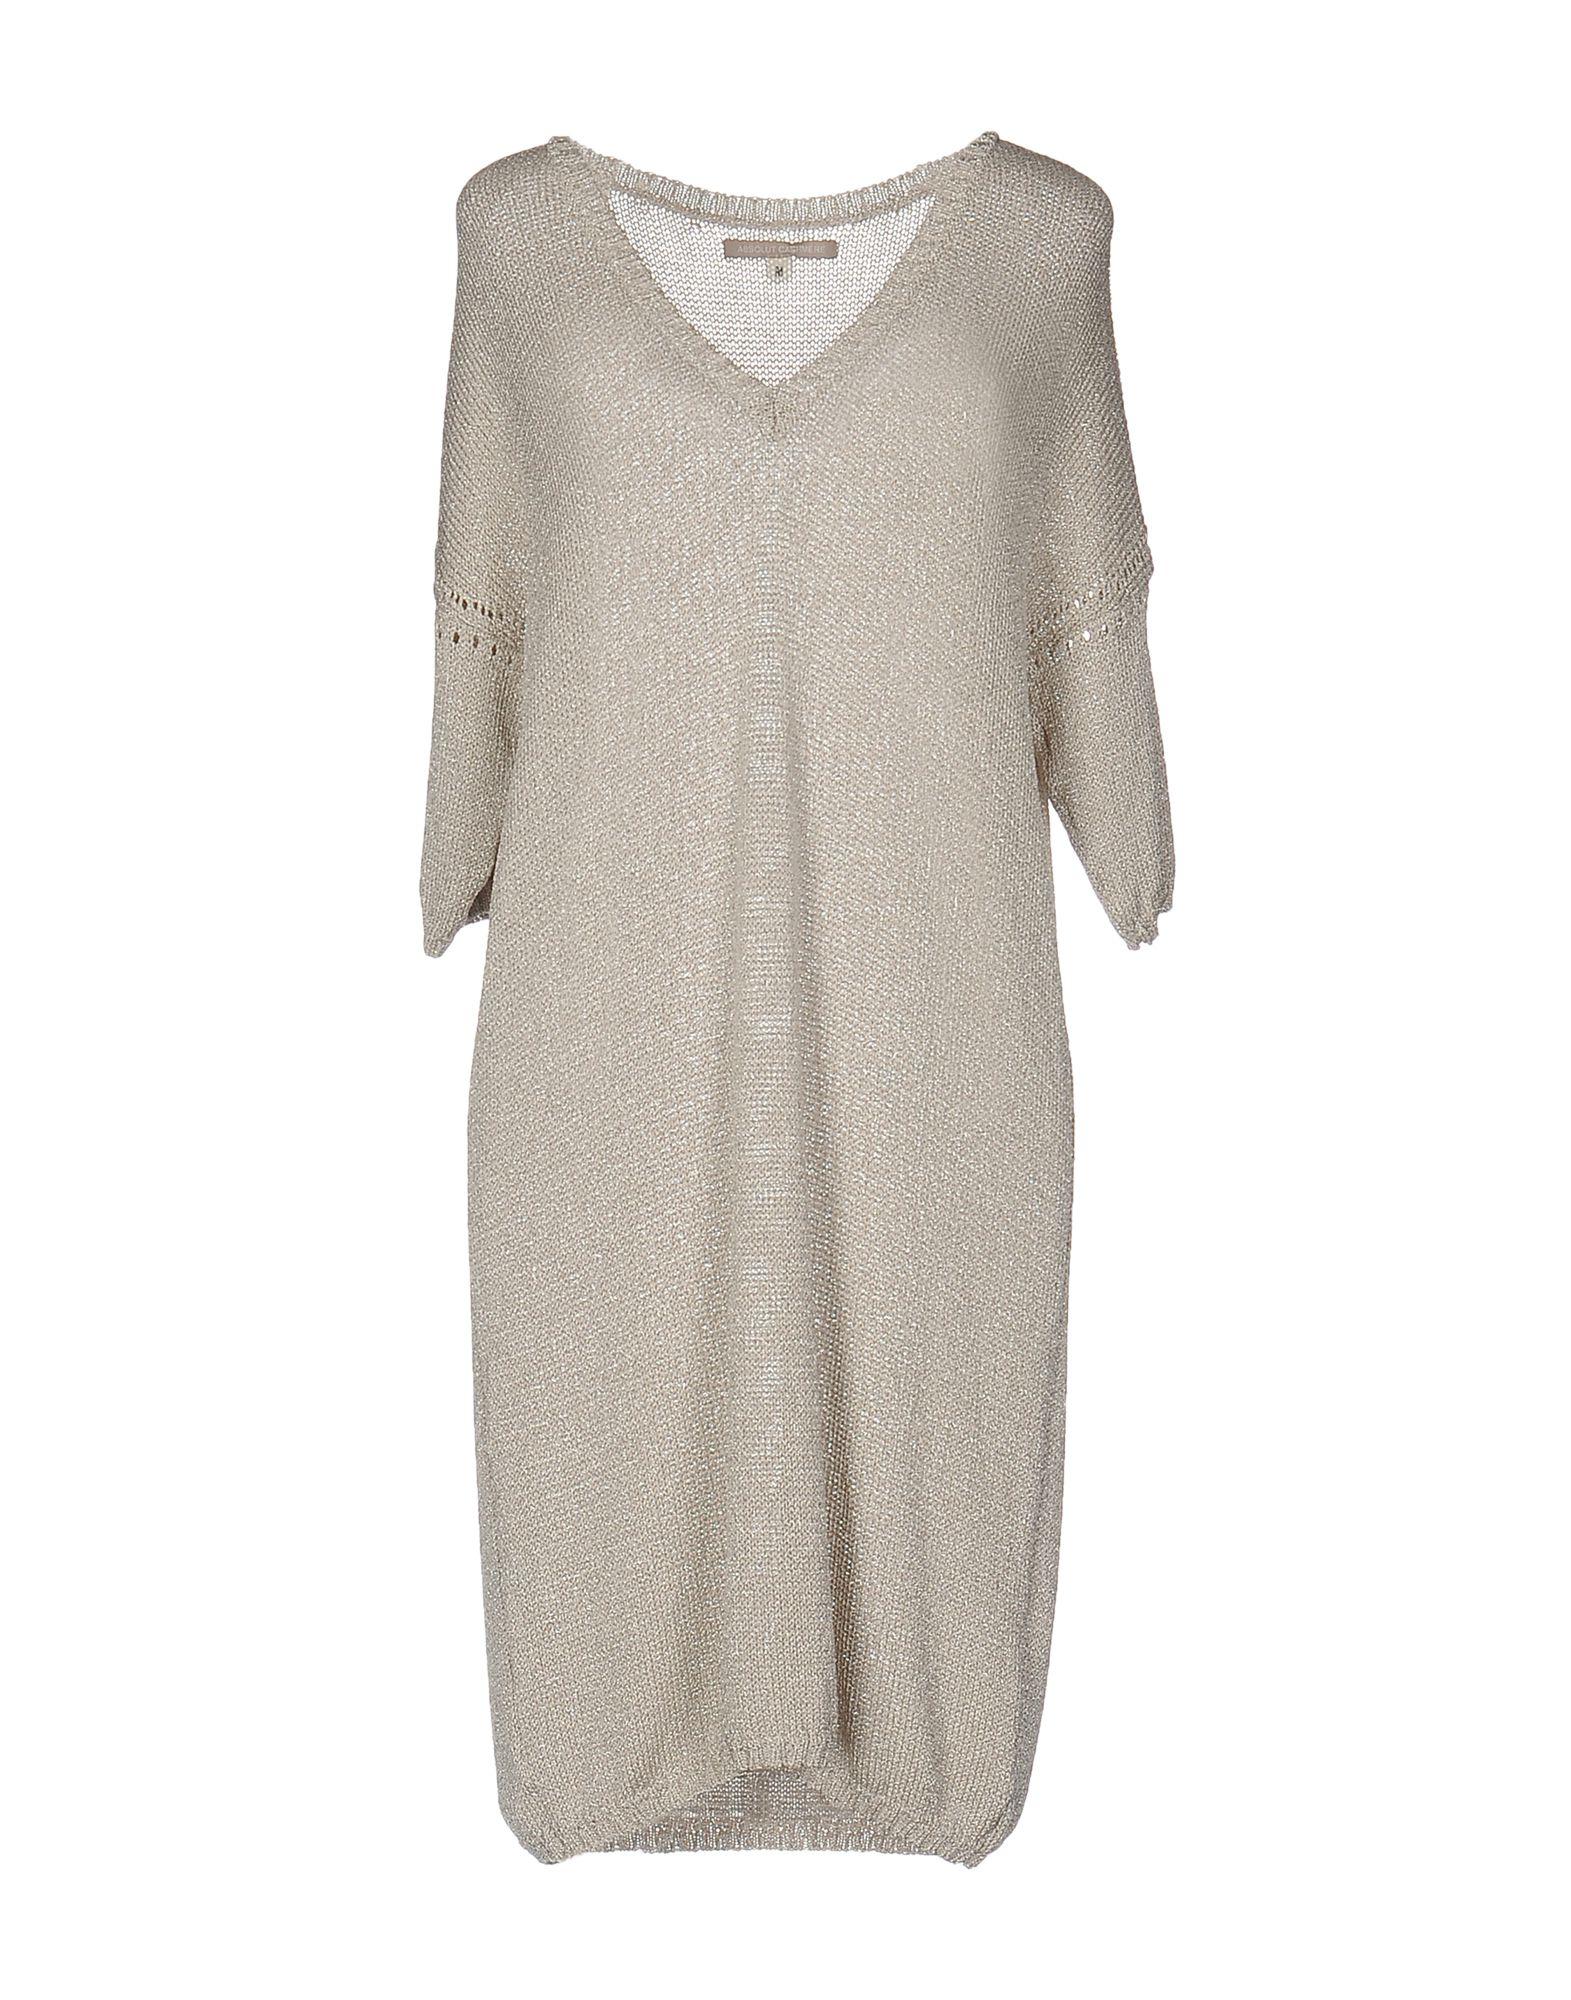 ABSOLUT CASHMERE Короткое платье puro cashmere короткое платье